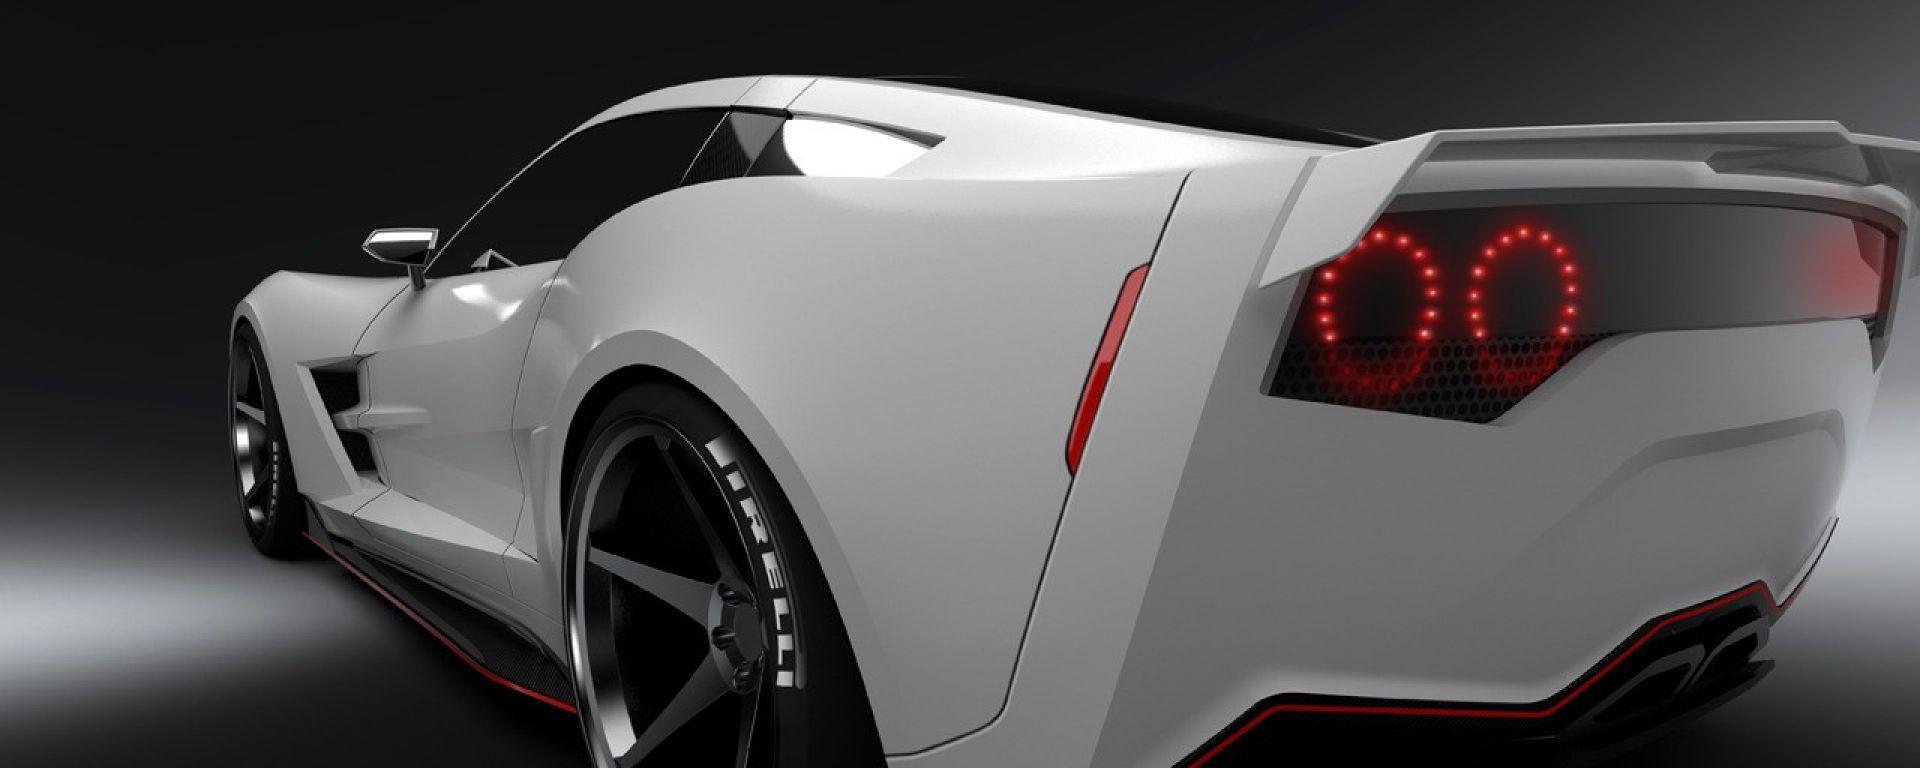 Supervettes SV8.R